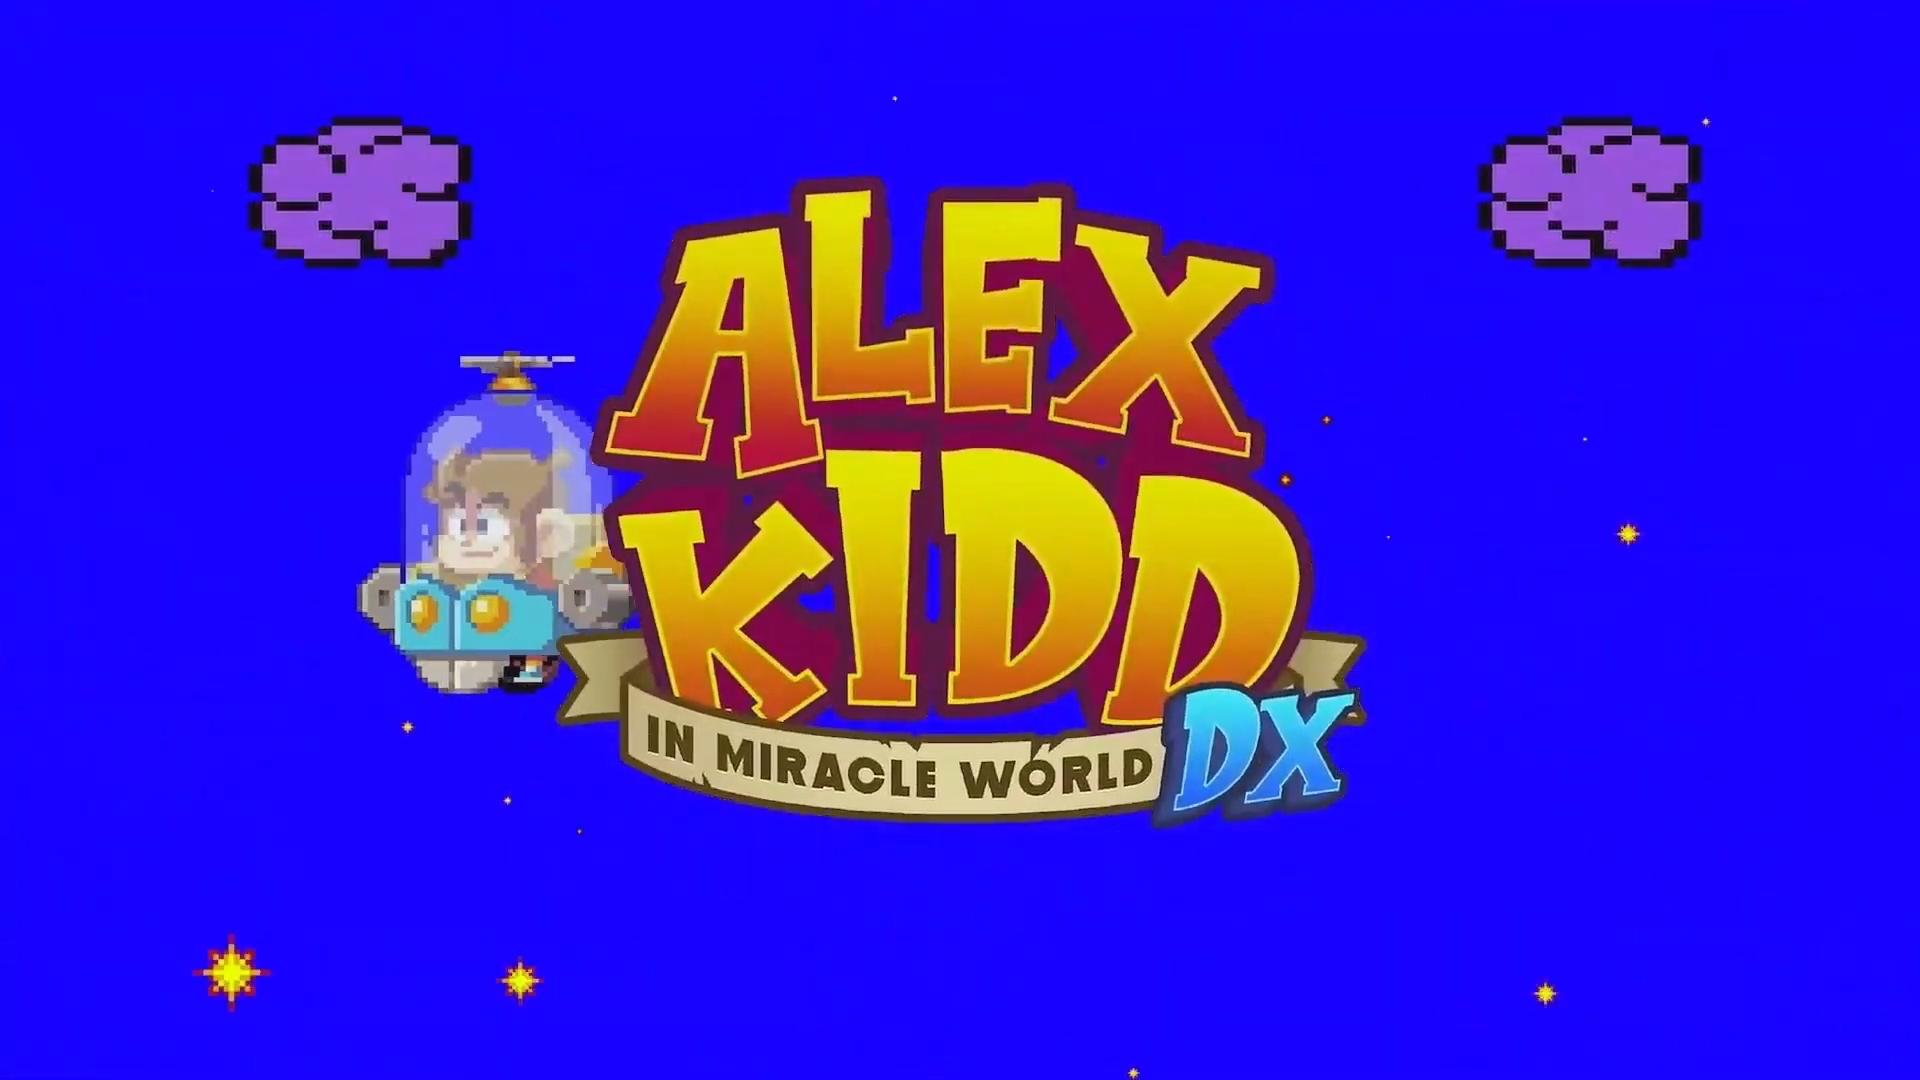 Análise   Alex Kidd in Miracle World DX: Um jovem e seu reinado